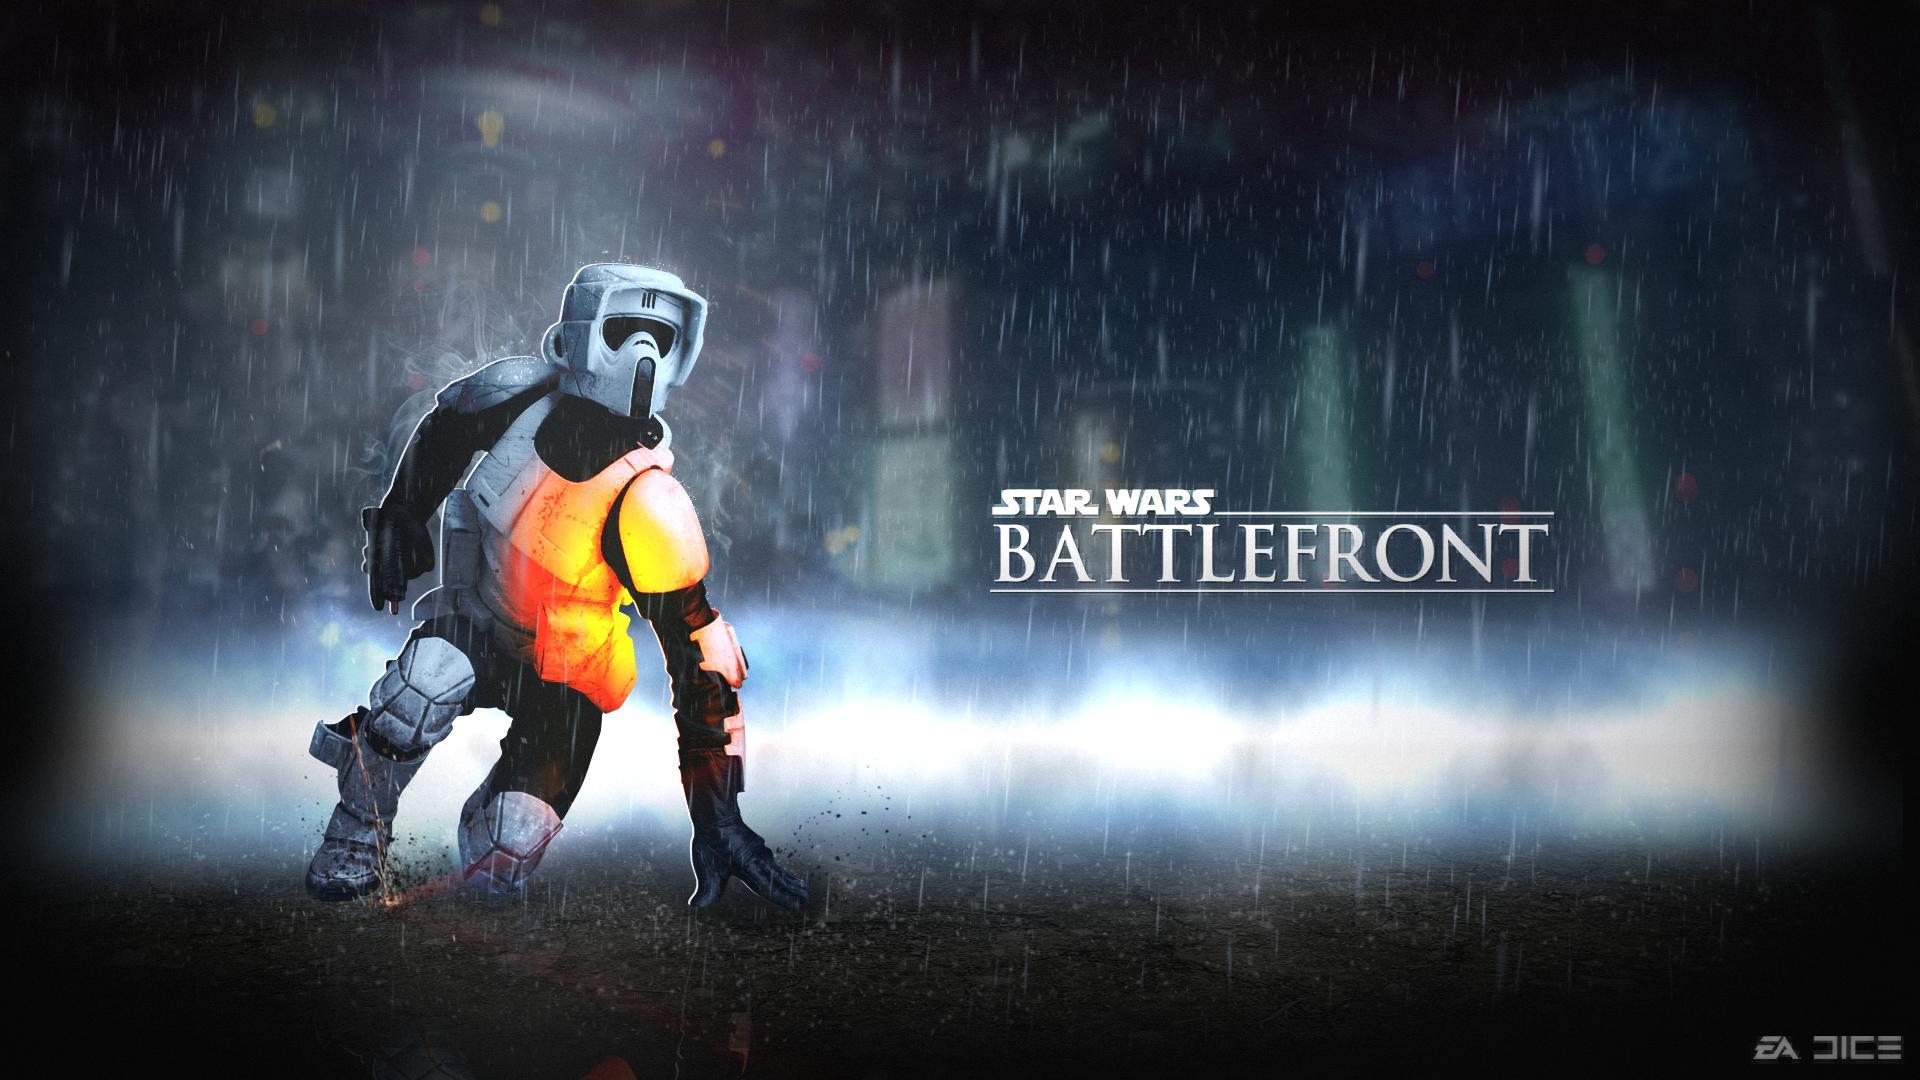 Star Wars Battlefront Wallpapers 1080p